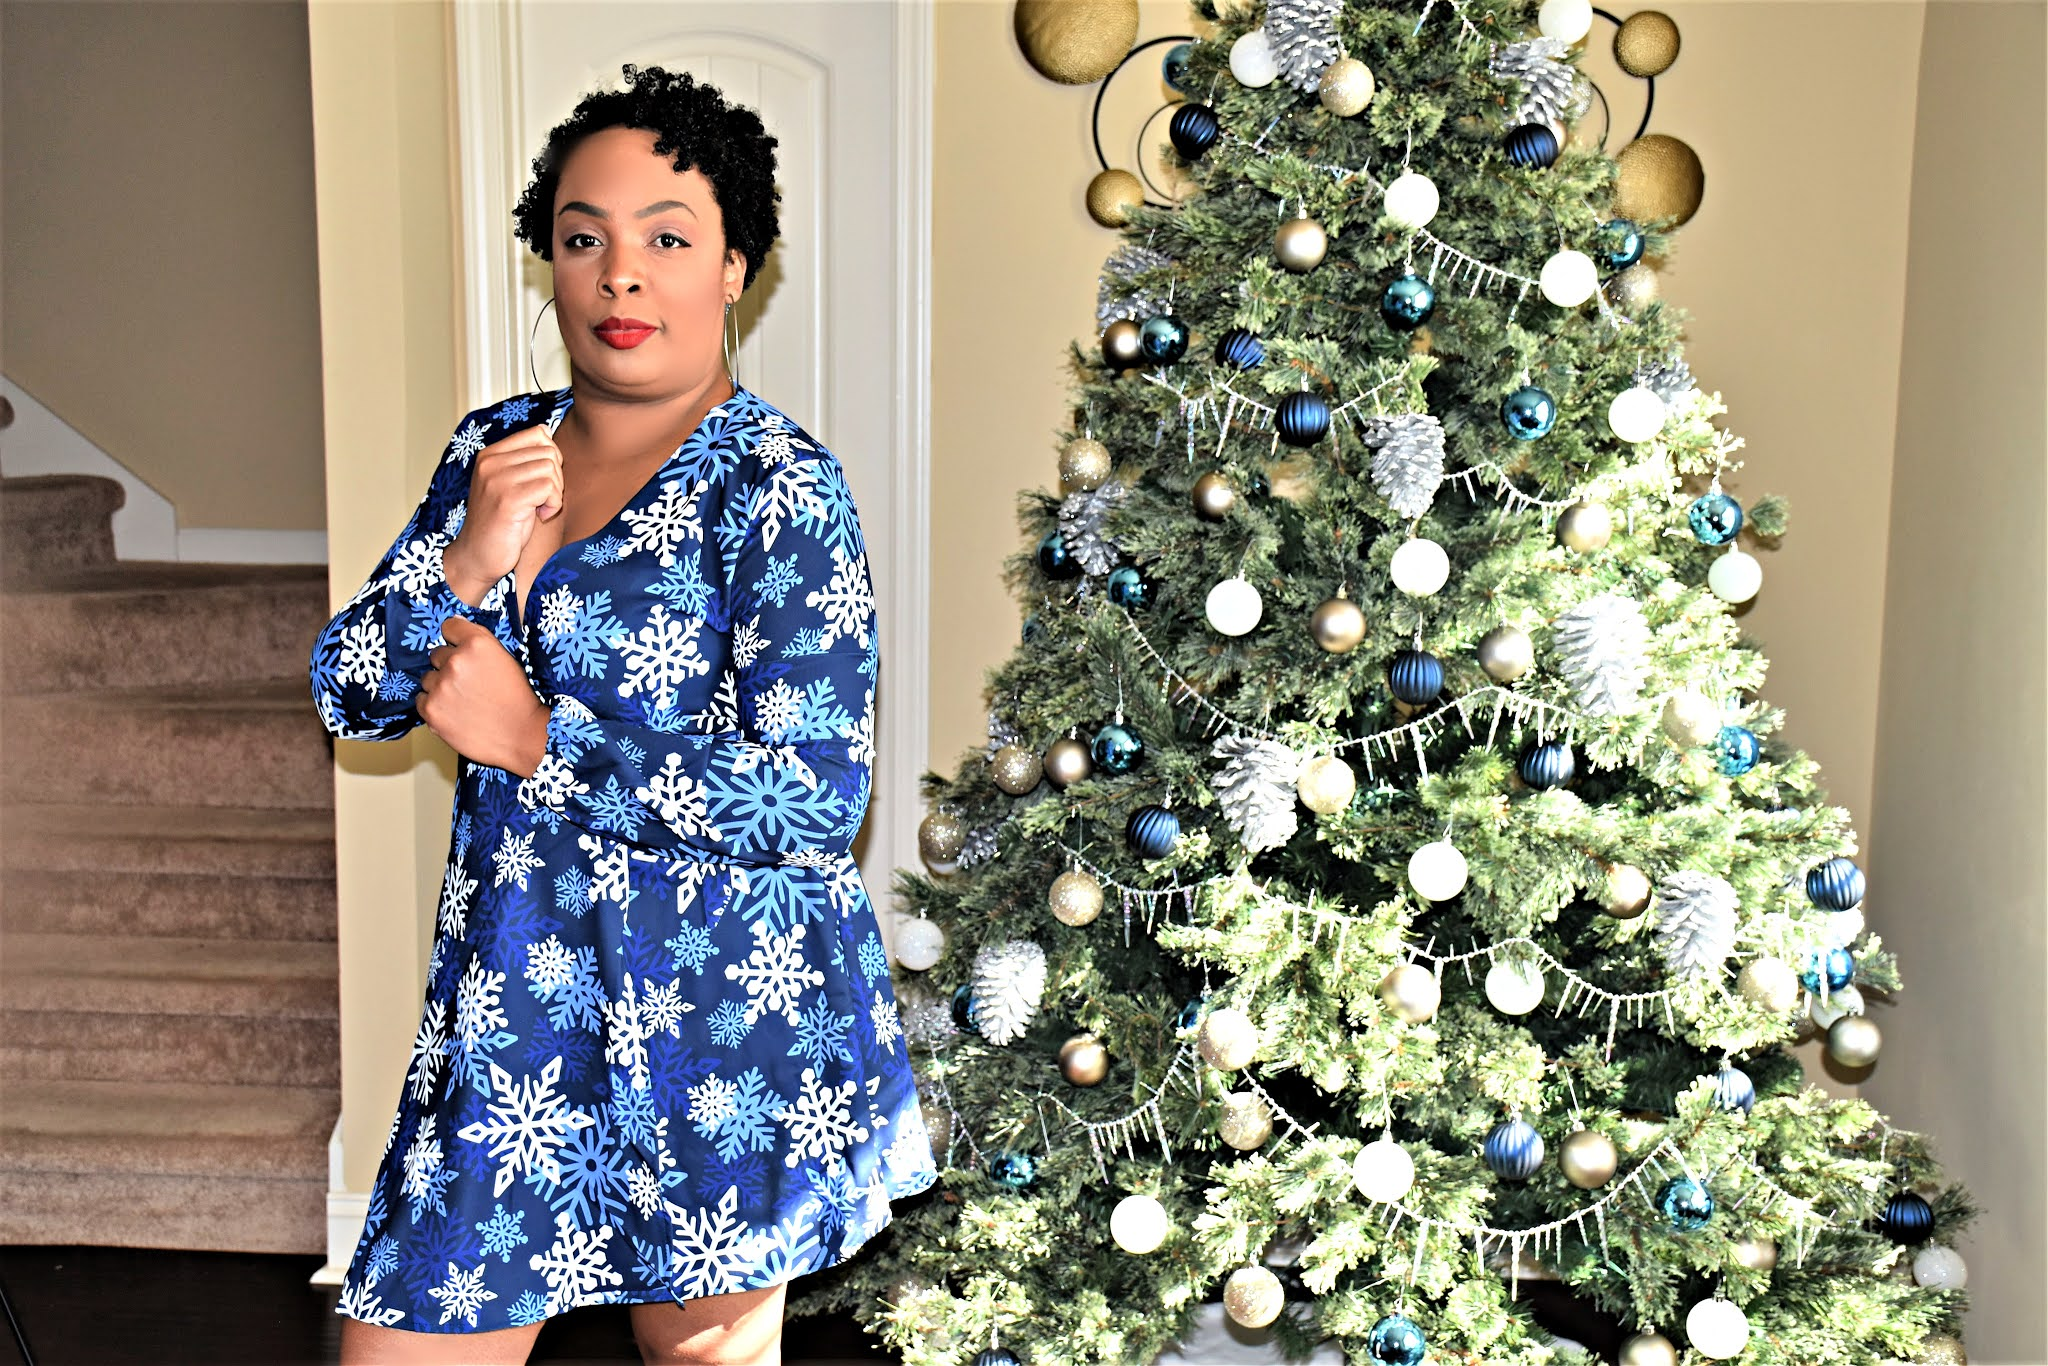 Dark Blue Snowflake Christmas Party Dress